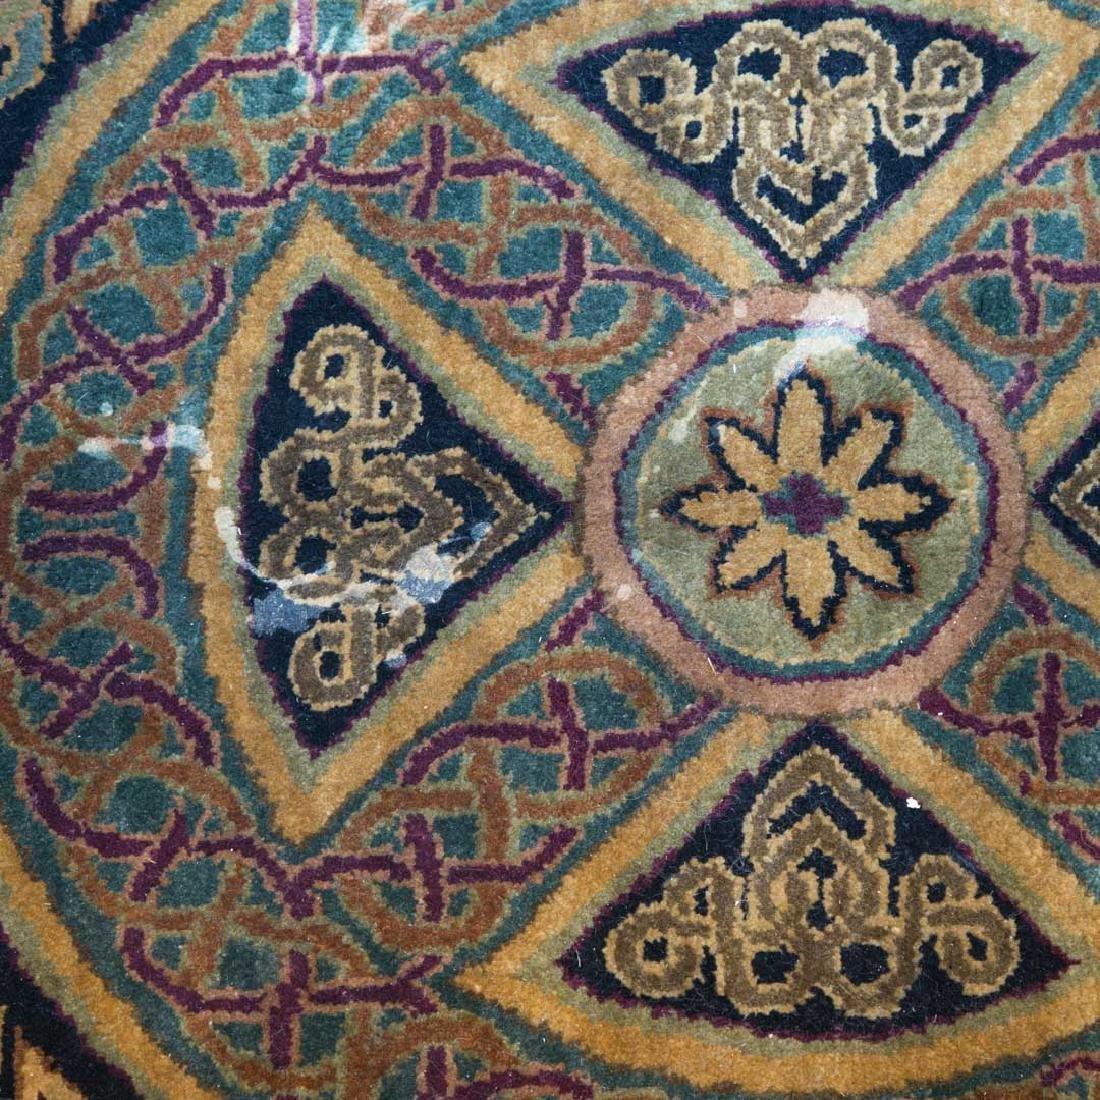 Indo Agra carpet, approx. 8.10 x 12.1 - 4